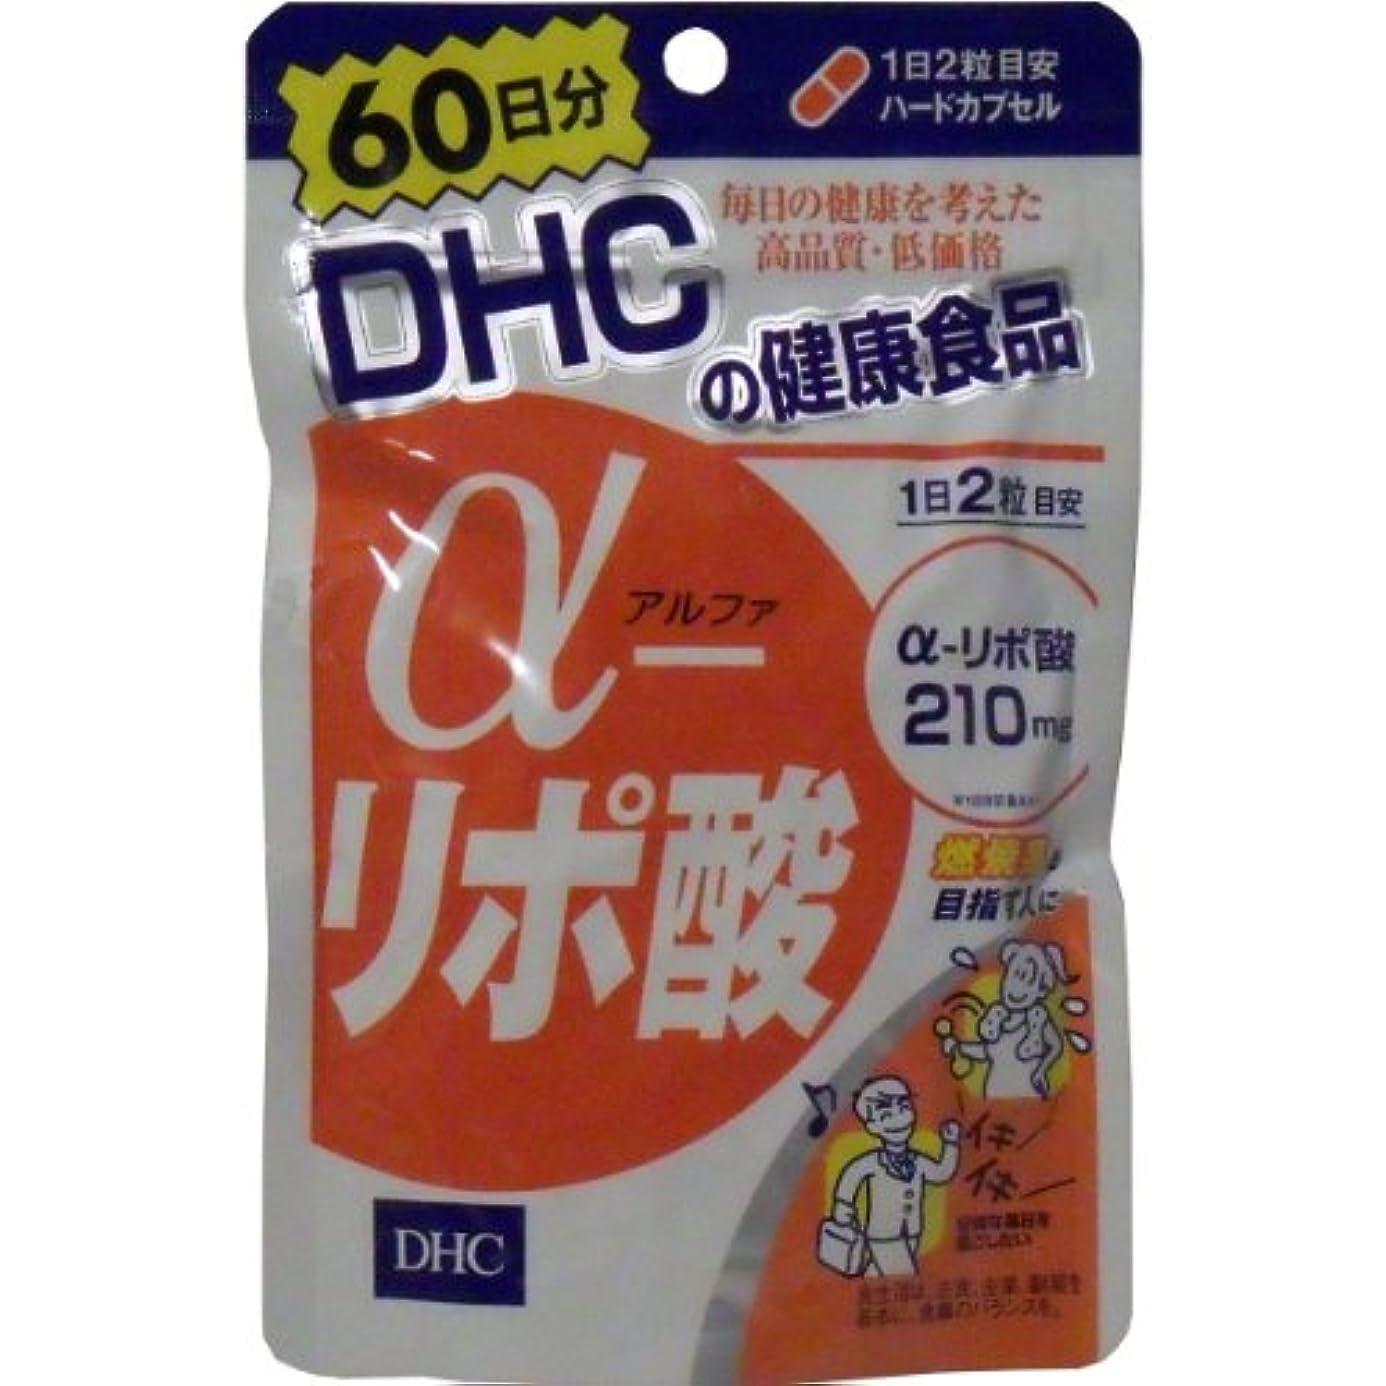 支店施設療法DHC α-リポ酸 60日分 120粒